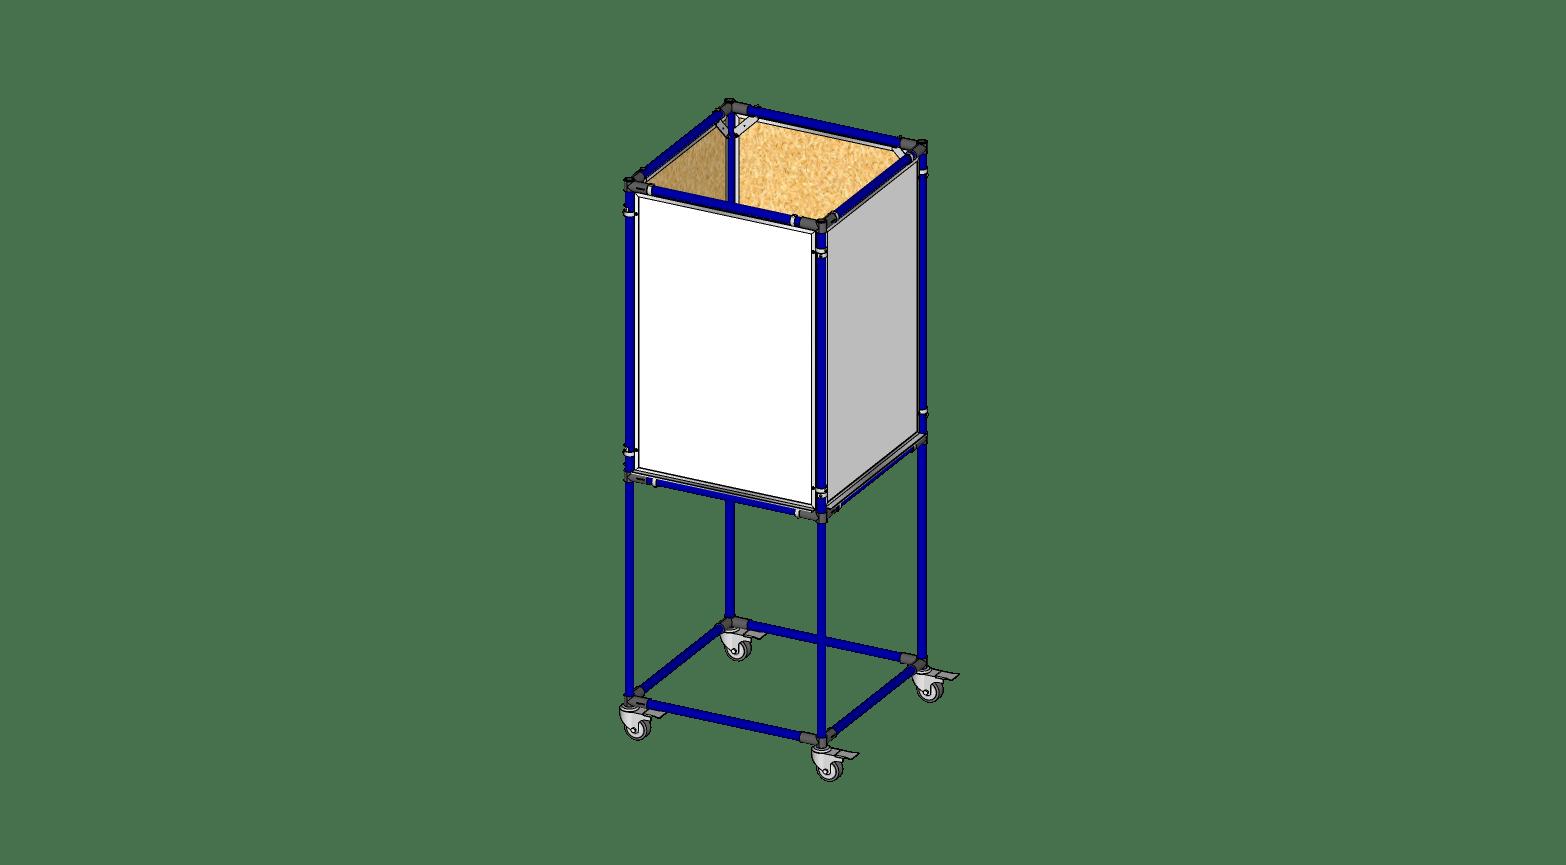 4 Sided 2' x 3' Whiteboard